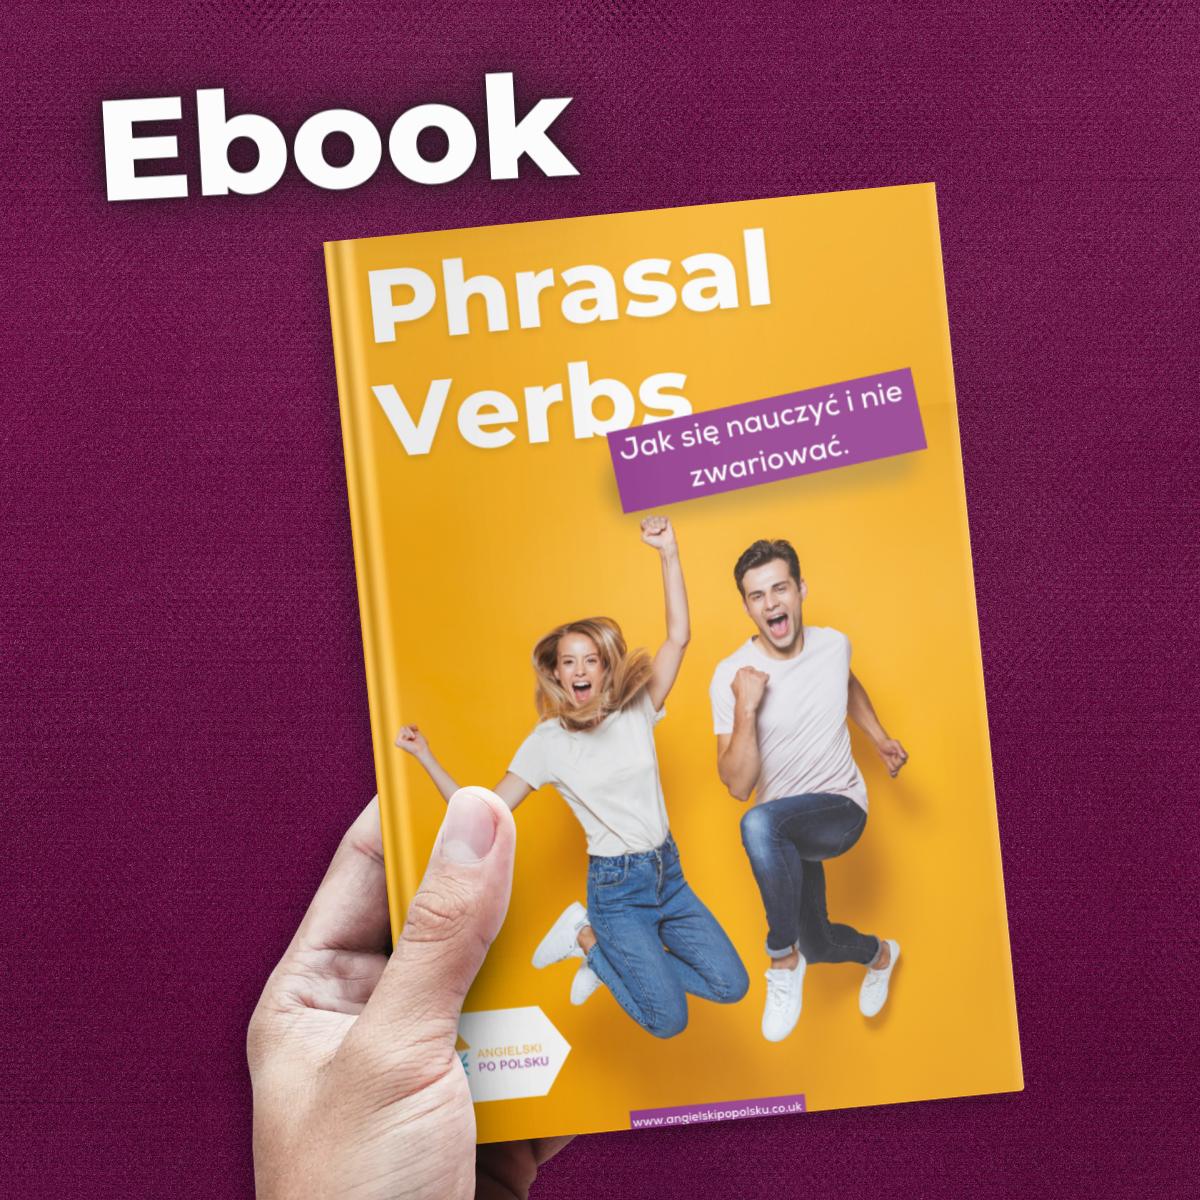 Ebook Phrasal Verbs APP